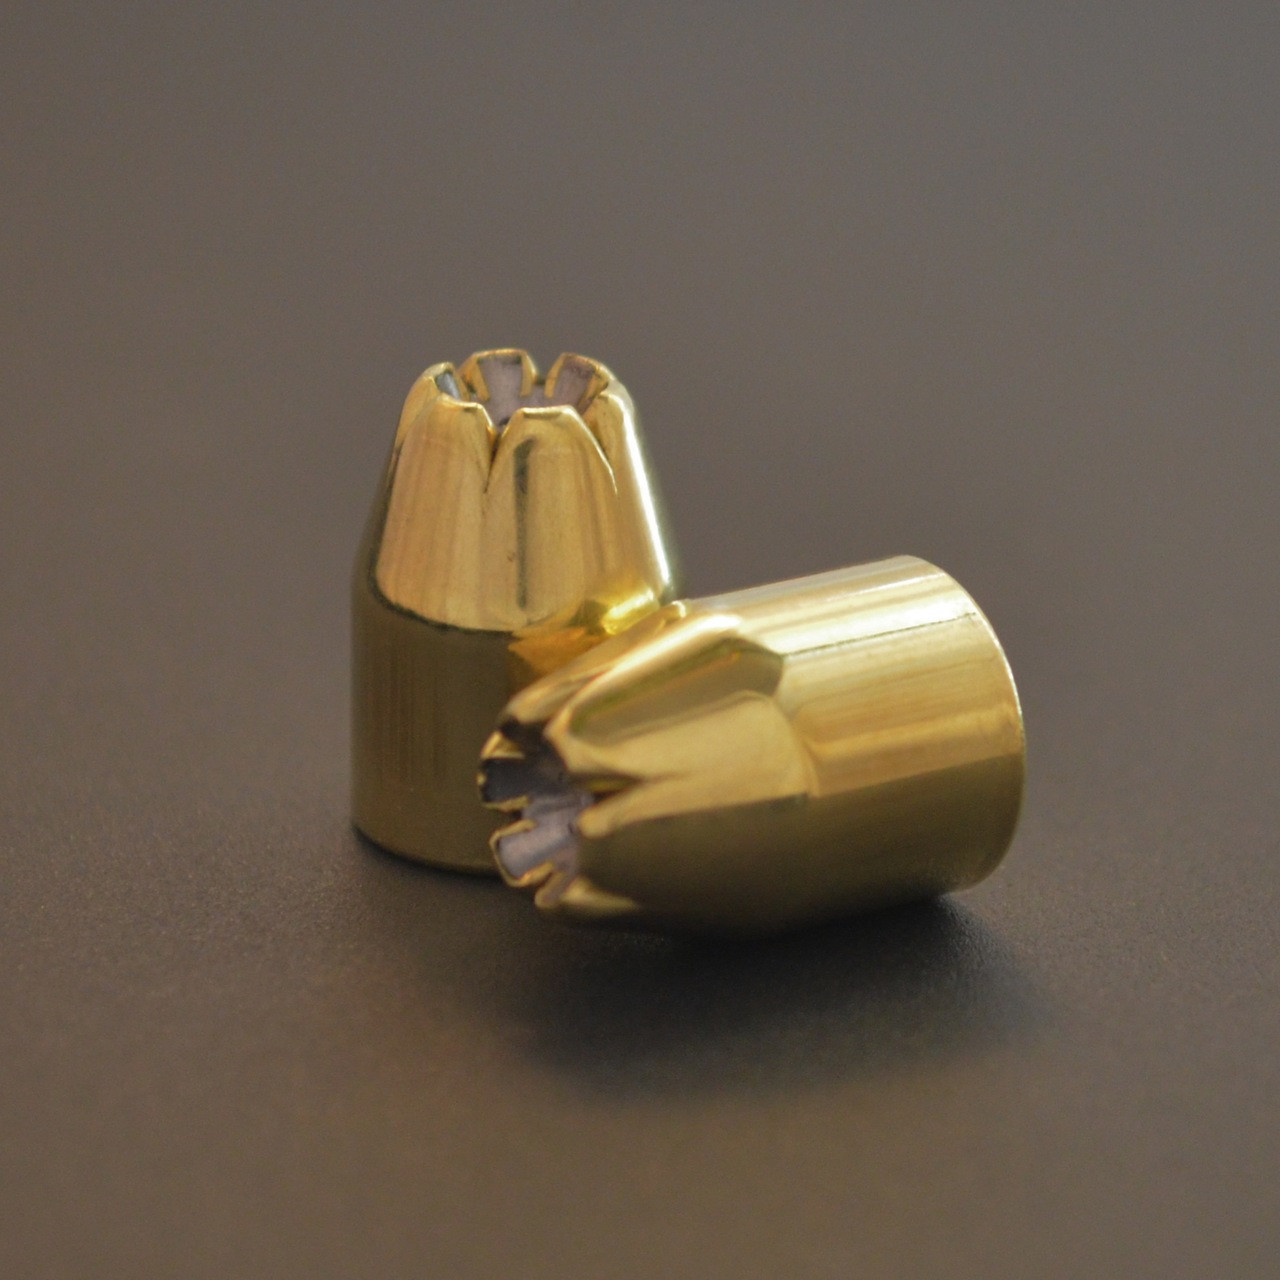 10mm/.40 155gr JHP - 1,000ct